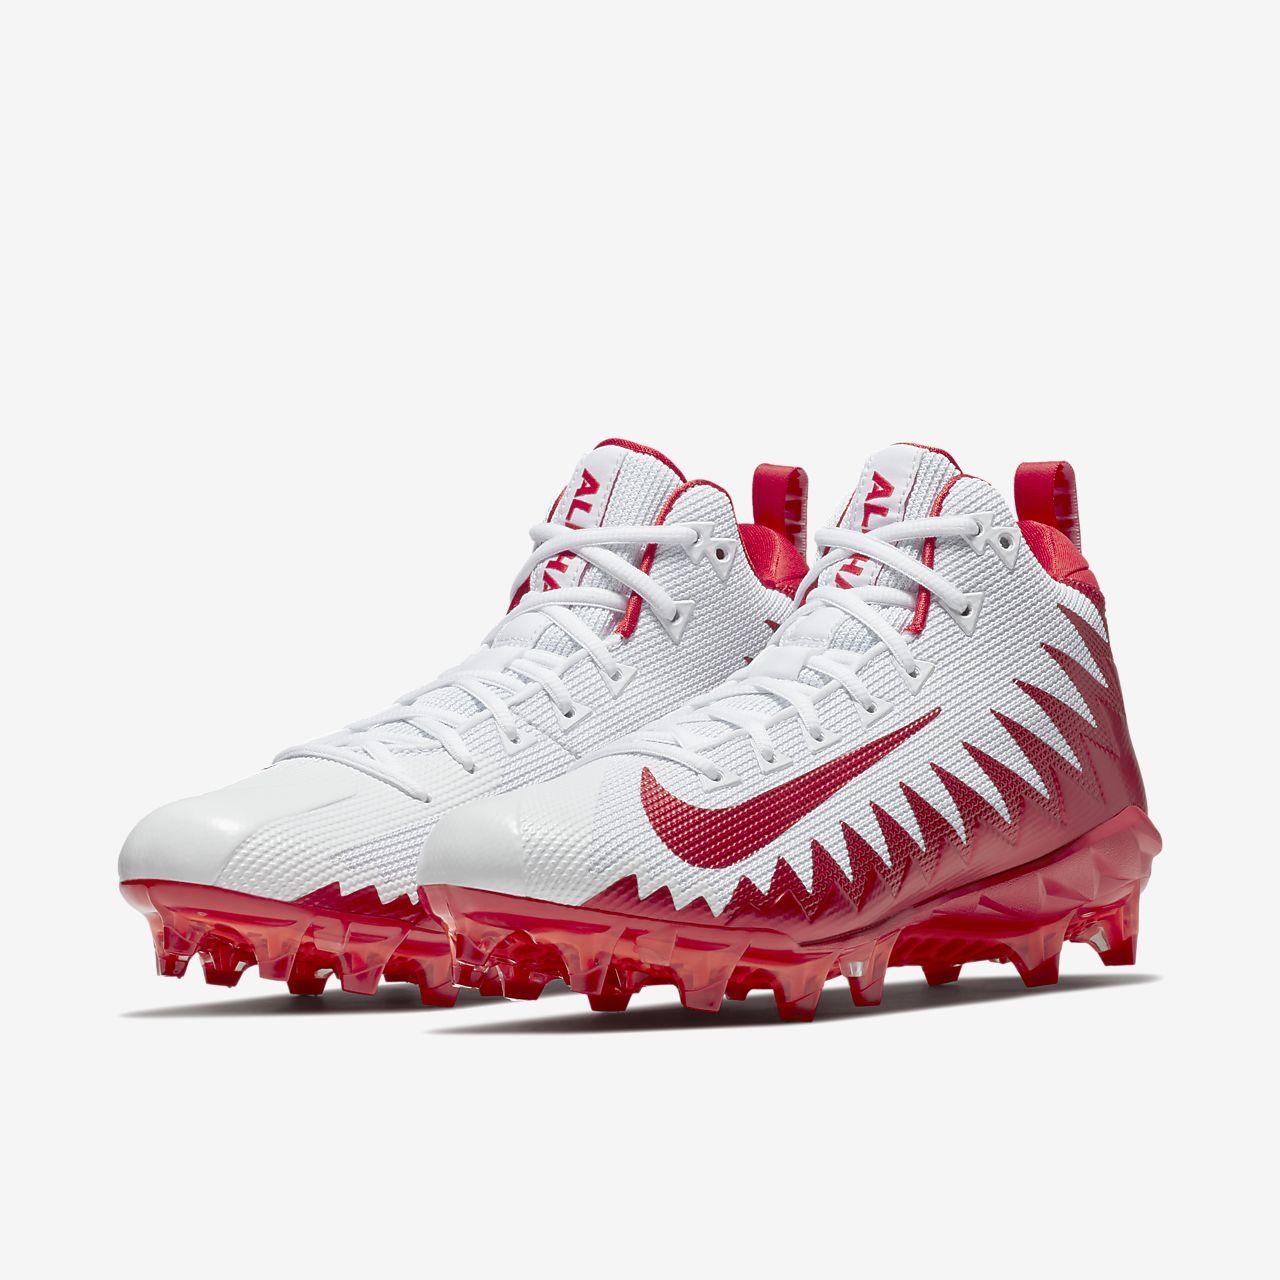 9a20d491a5996 Nike Alpha Menace Pro Mid Men s Football Cleat. Nike.com